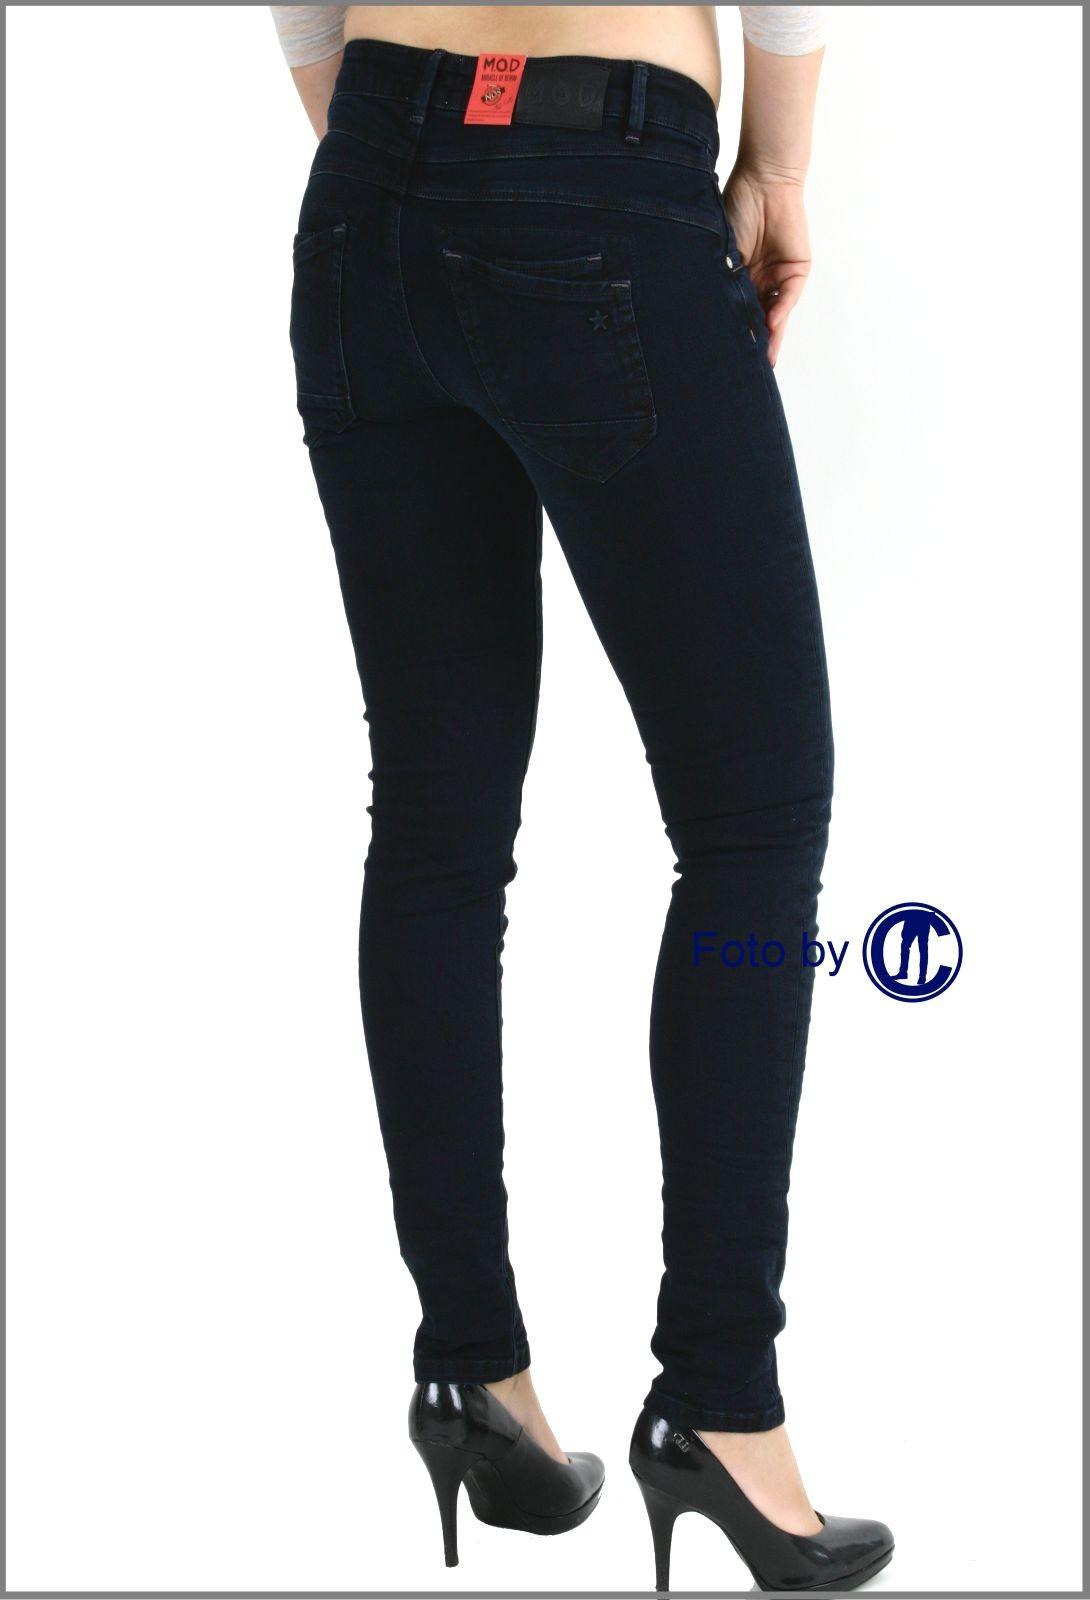 7a6a5a7e0000 ... Jeans von M.O.D. Ulla Slim Fit blue-black ...